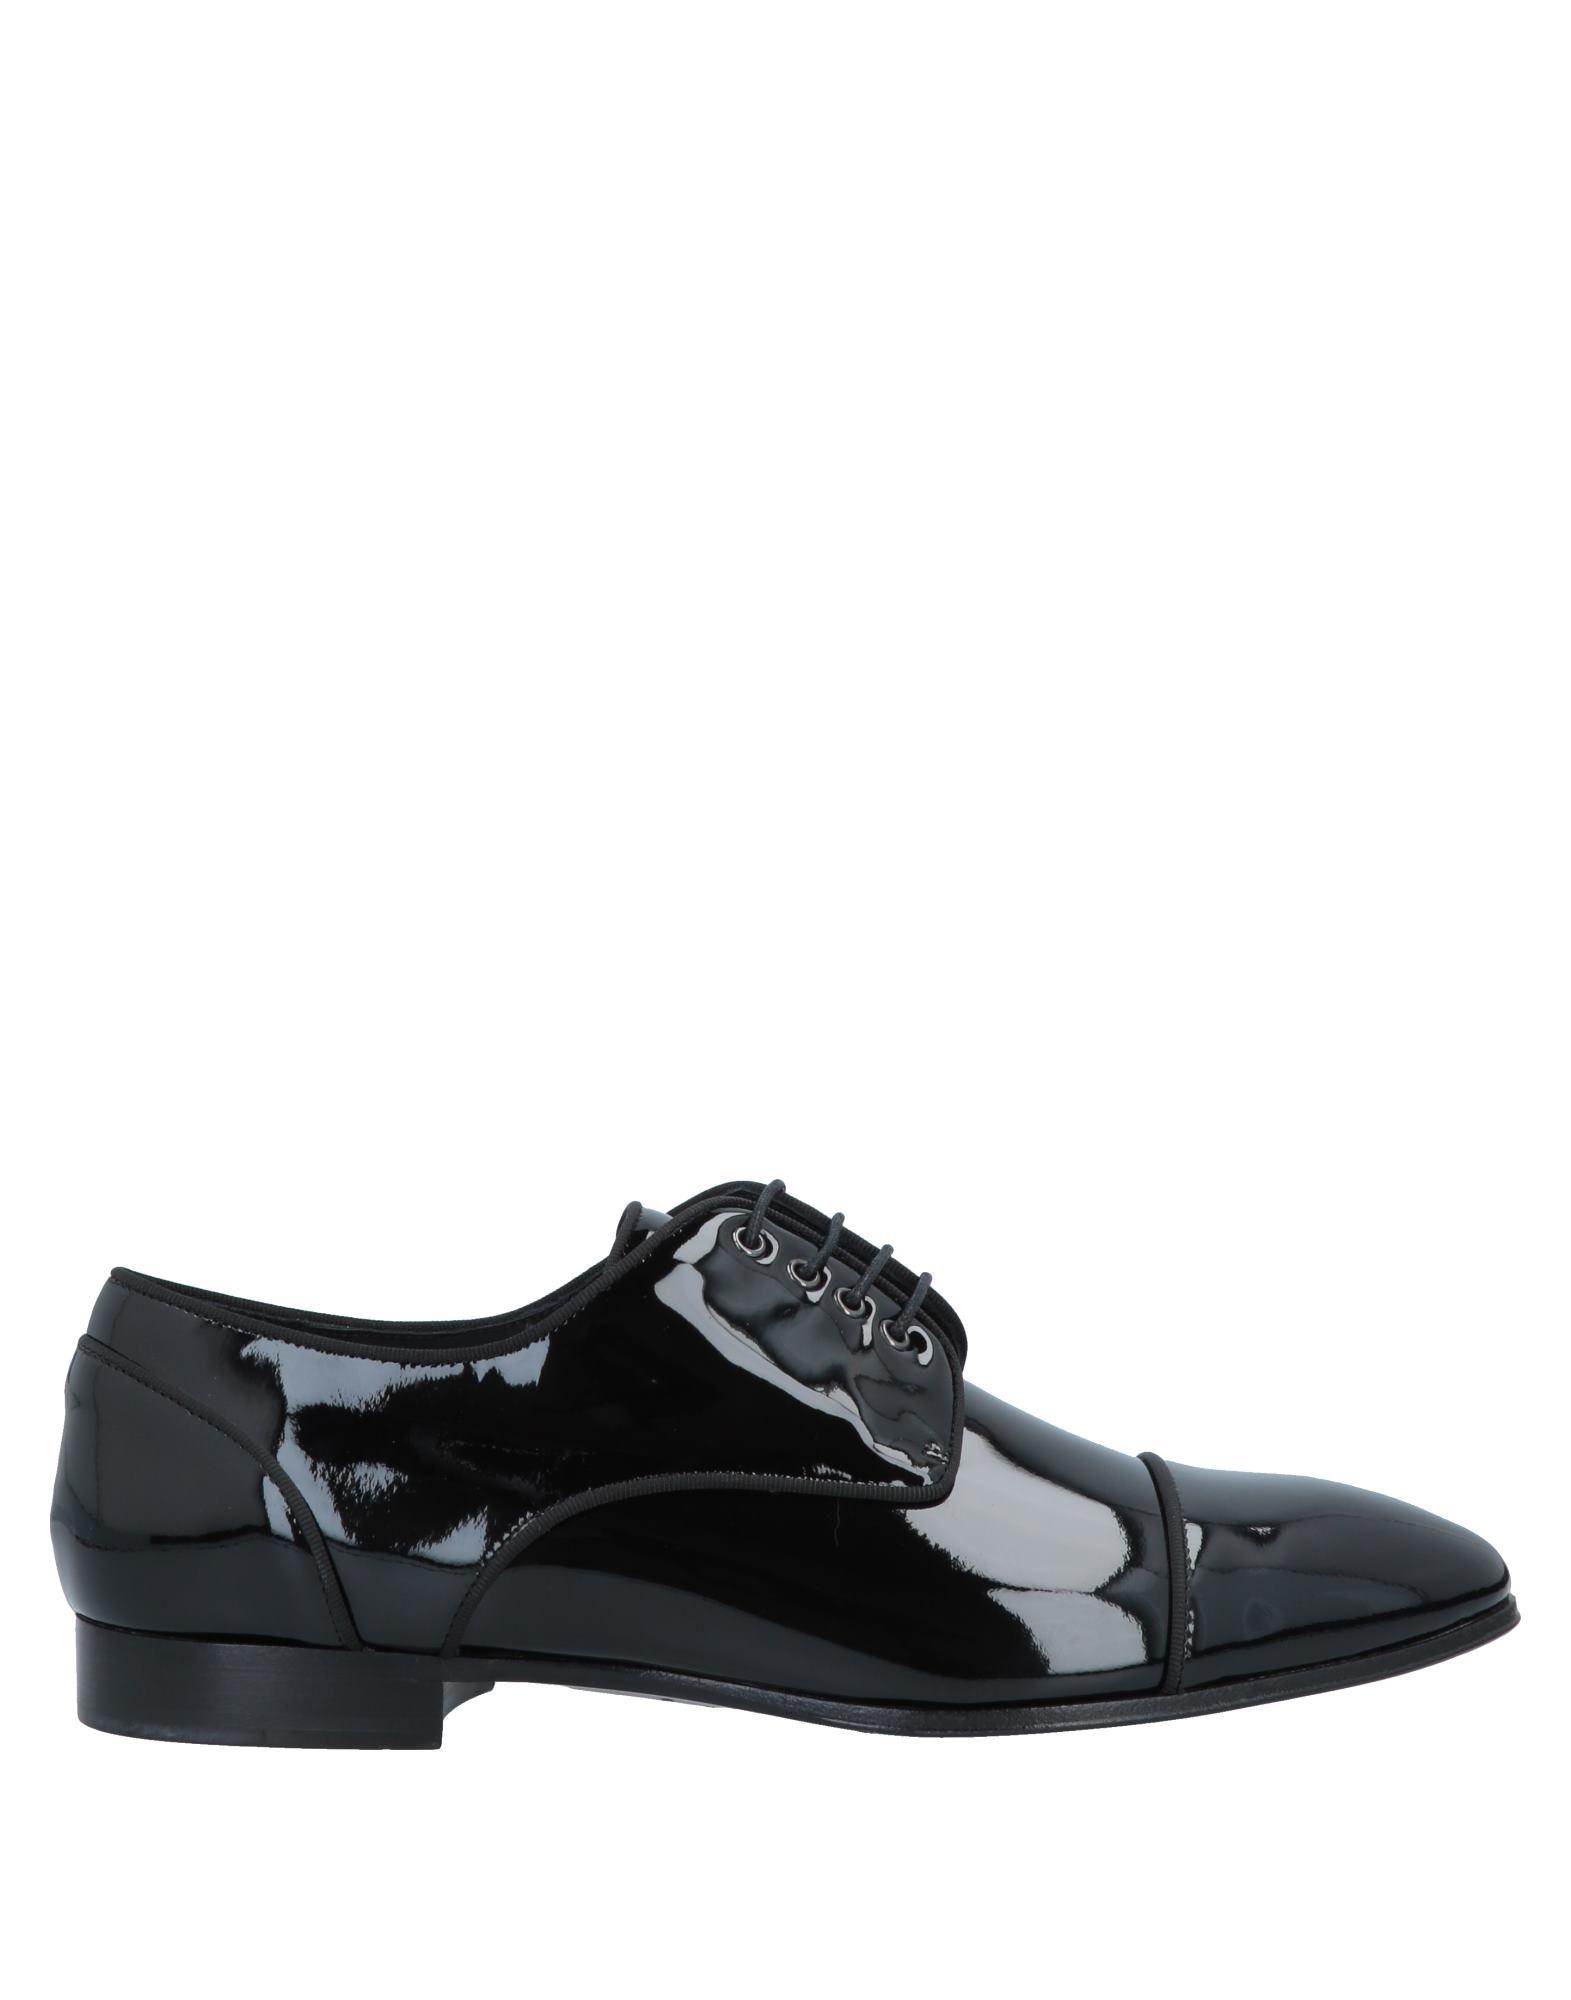 LOUIS LEEMAN Обувь на шнурках кеды louis leeman